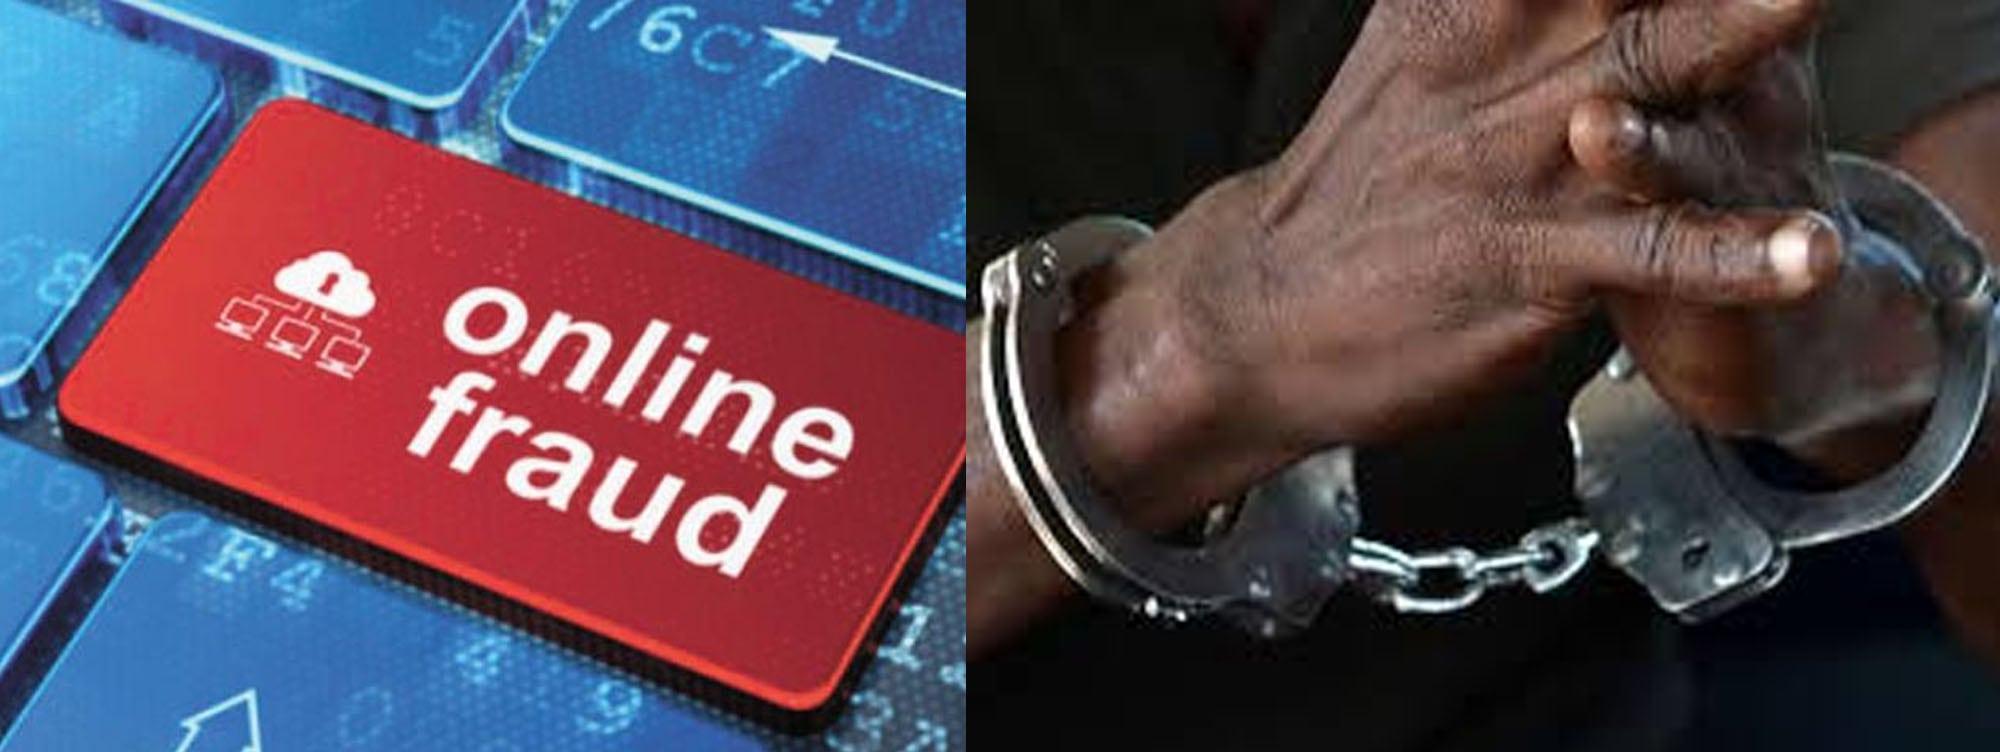 Online Bank Fraud: Rajasthan Police Arrests 3 Nigerians and One Manipuri Girl